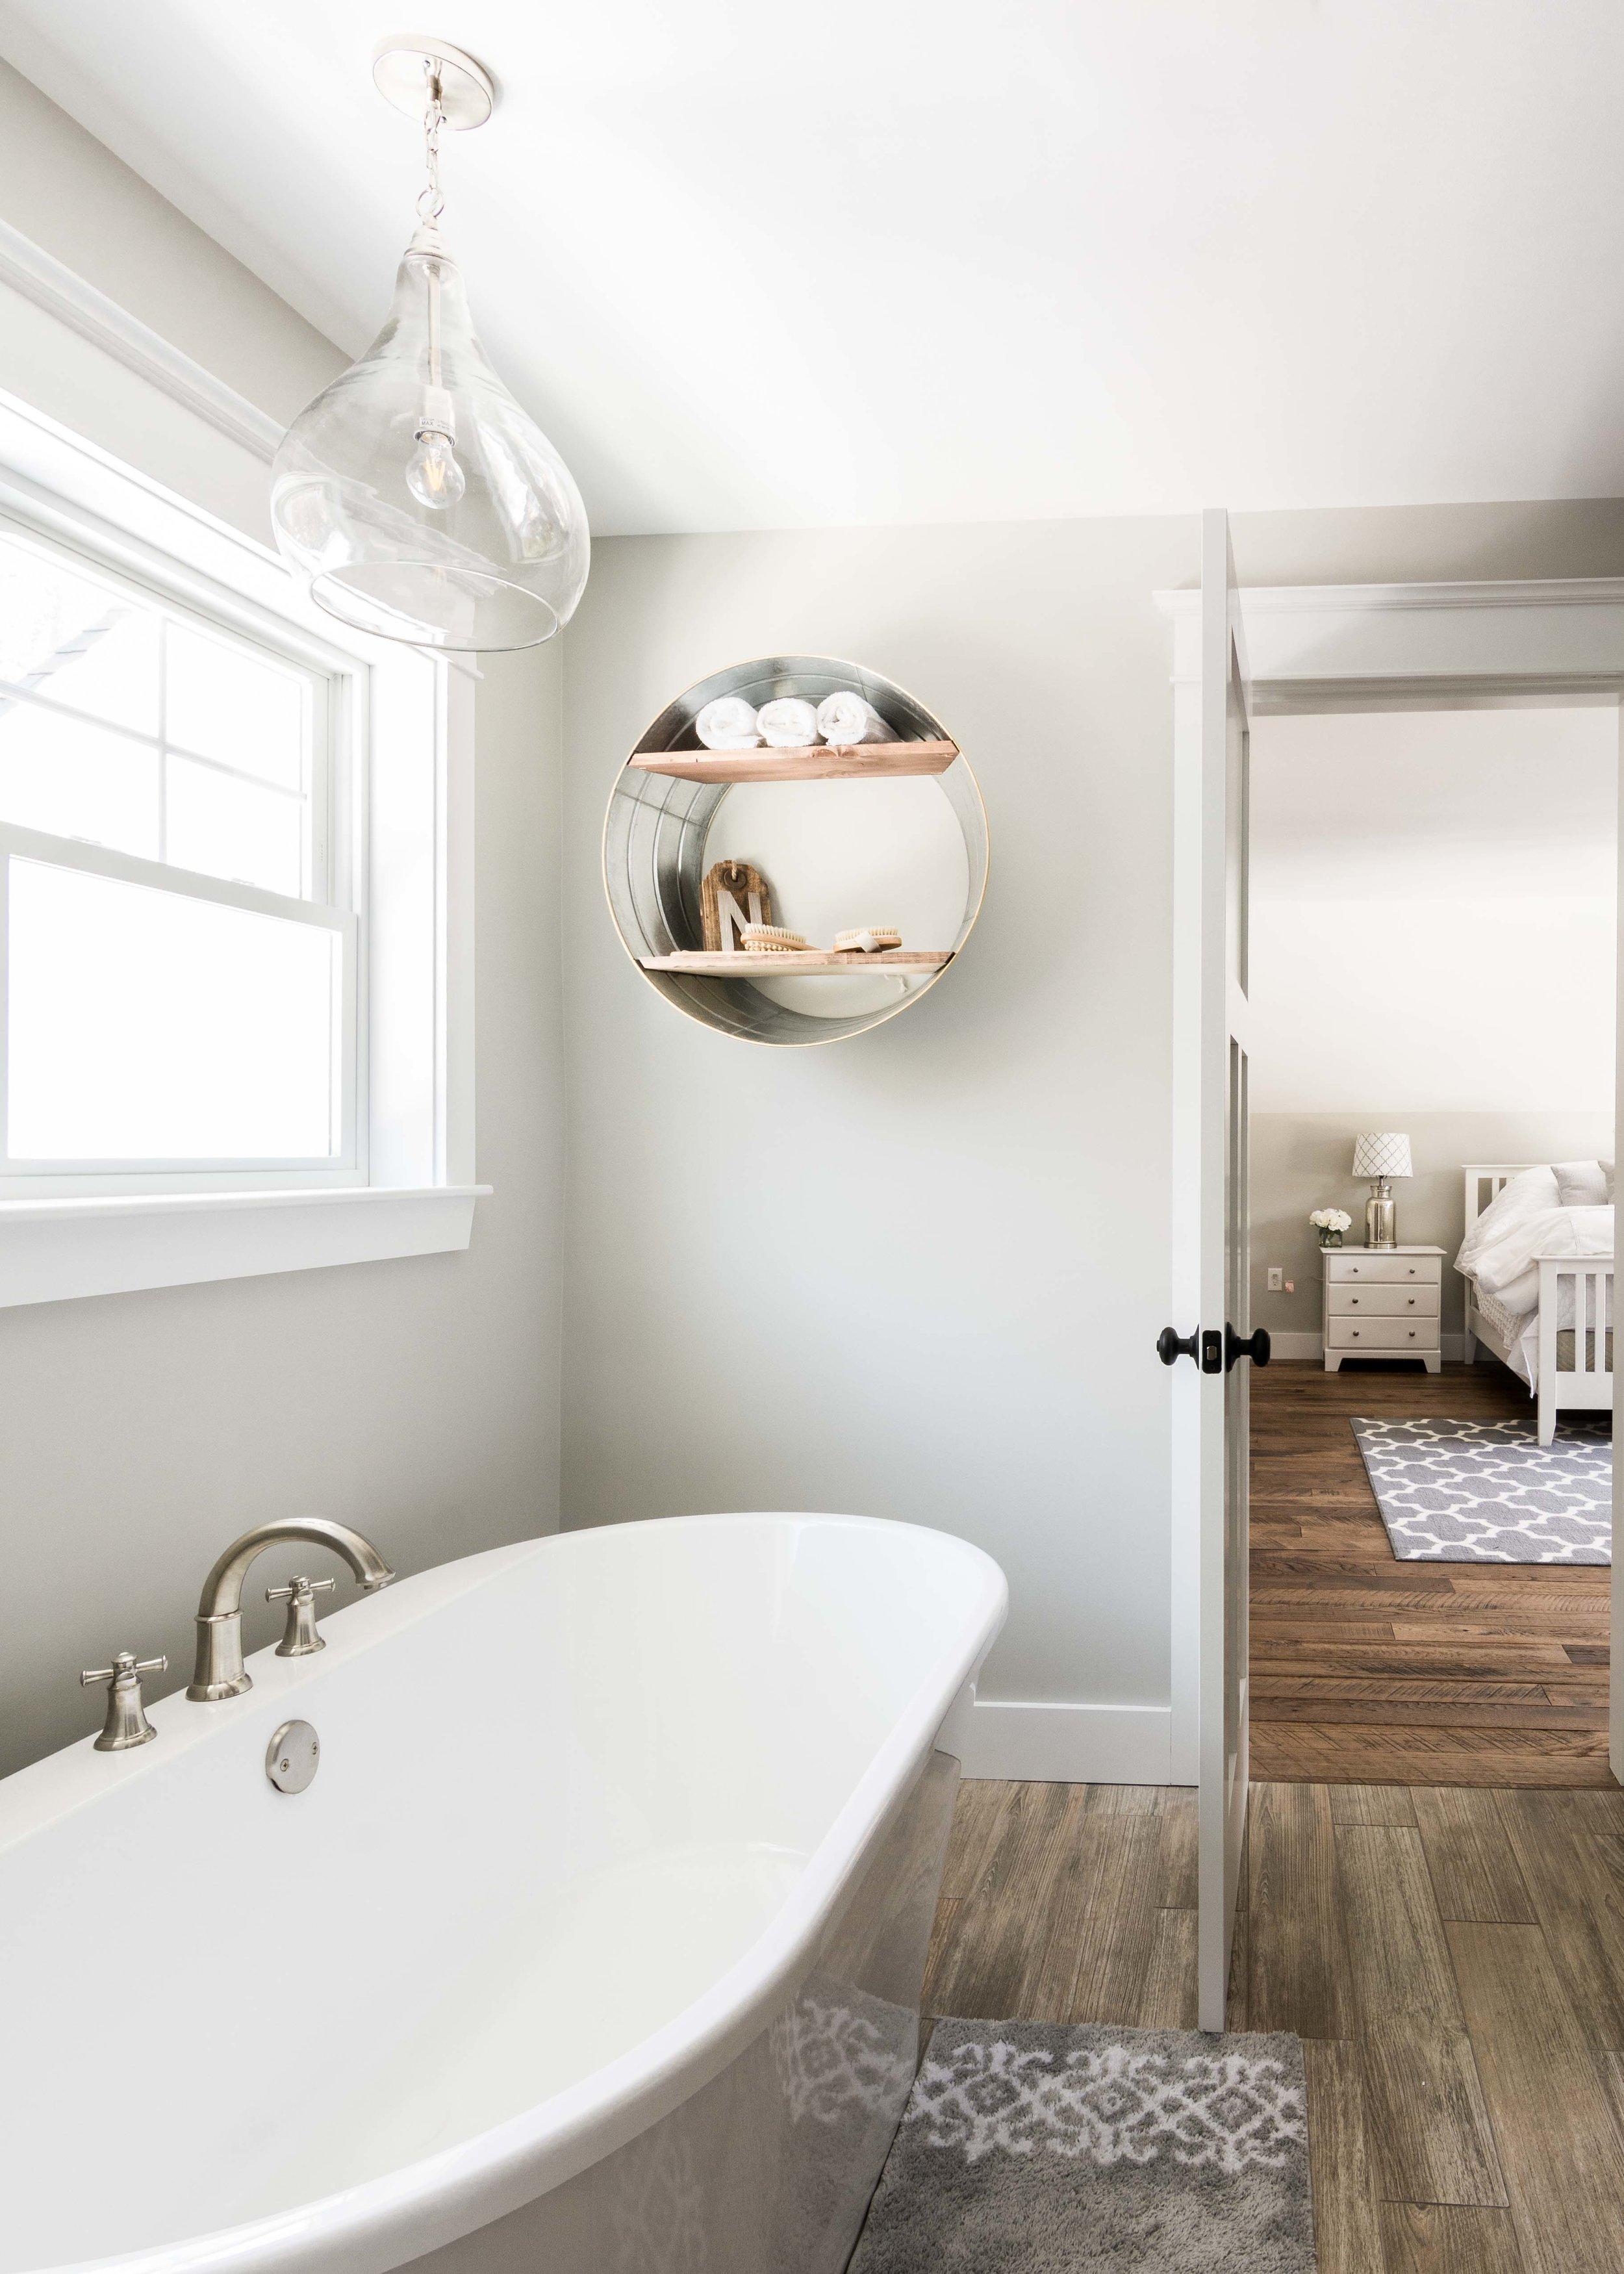 Birchwood Farmhouse, Gorham, Maine, Master Bathroom with Soaker Tub